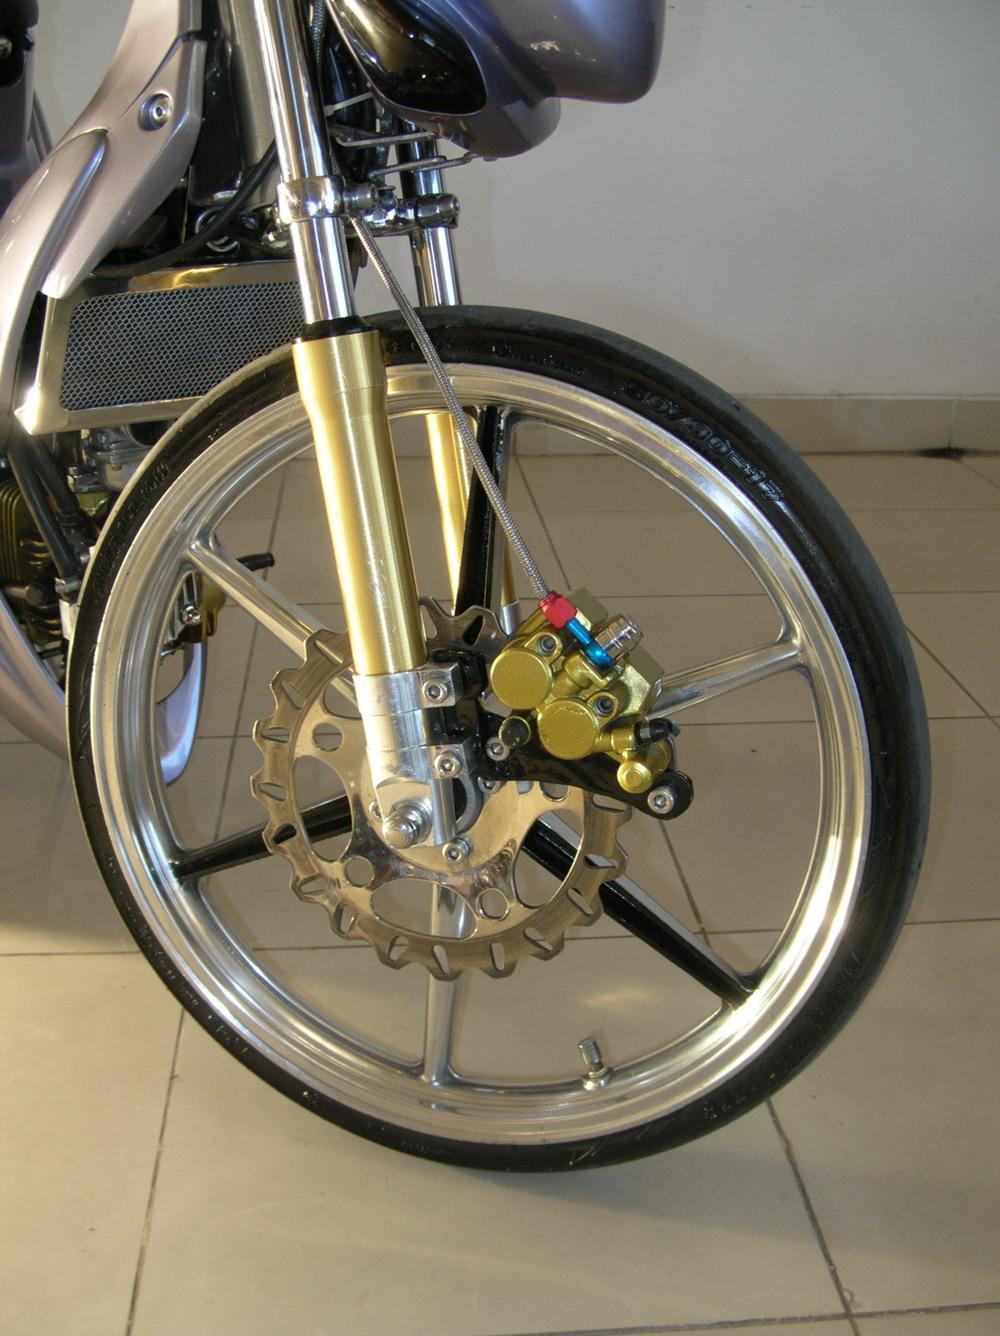 http://1.bp.blogspot.com/_mwzxyywxcGA/TI51AiwmMBI/AAAAAAAABHM/23cAt9gHKfI/s1600/front+tire+brake+modifikasi.jpg